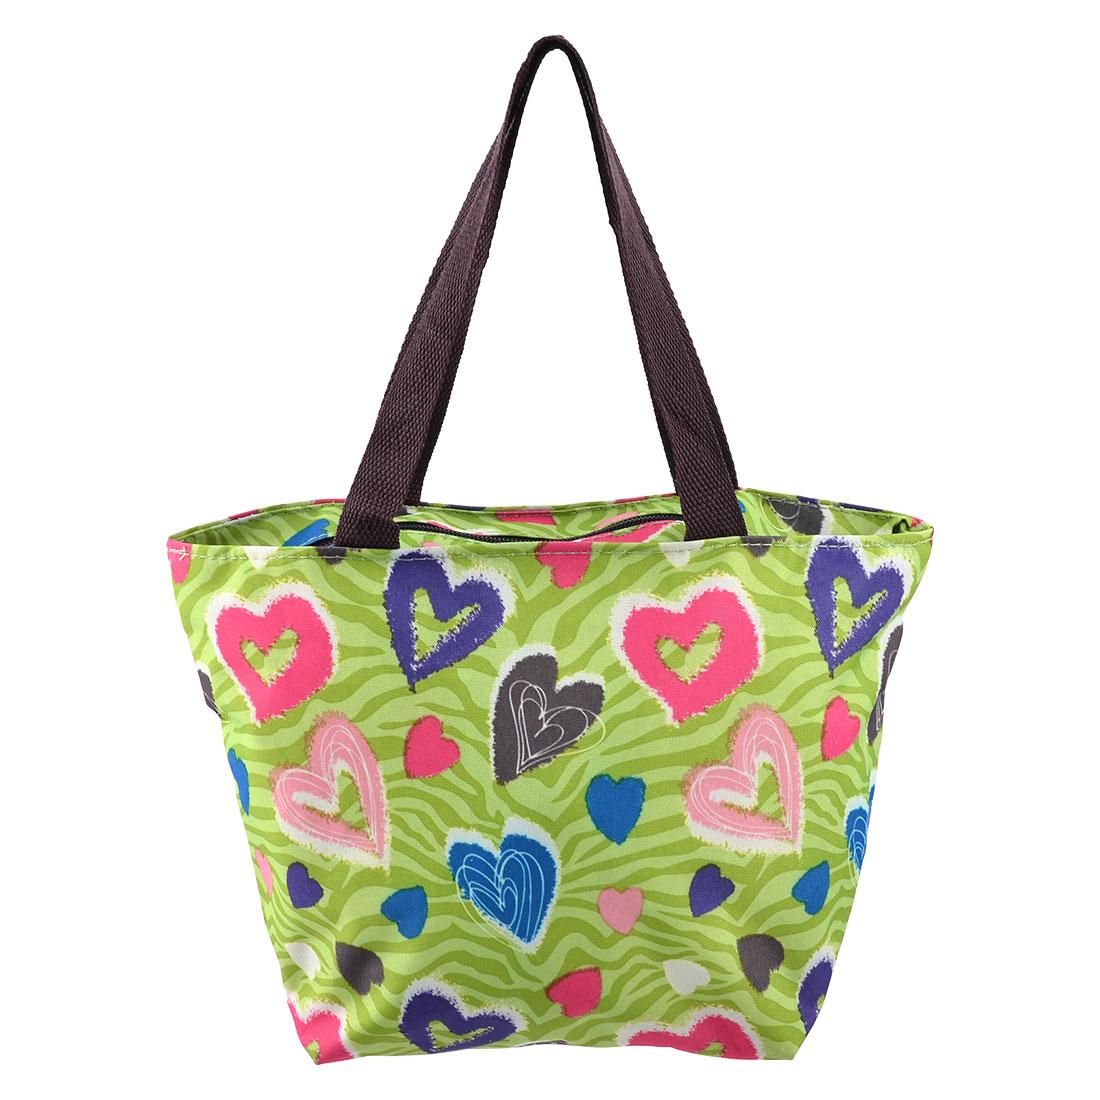 Outdoor Activity Polyester Heart Print Zipper Closure Lunch Cooler Pouch Bag